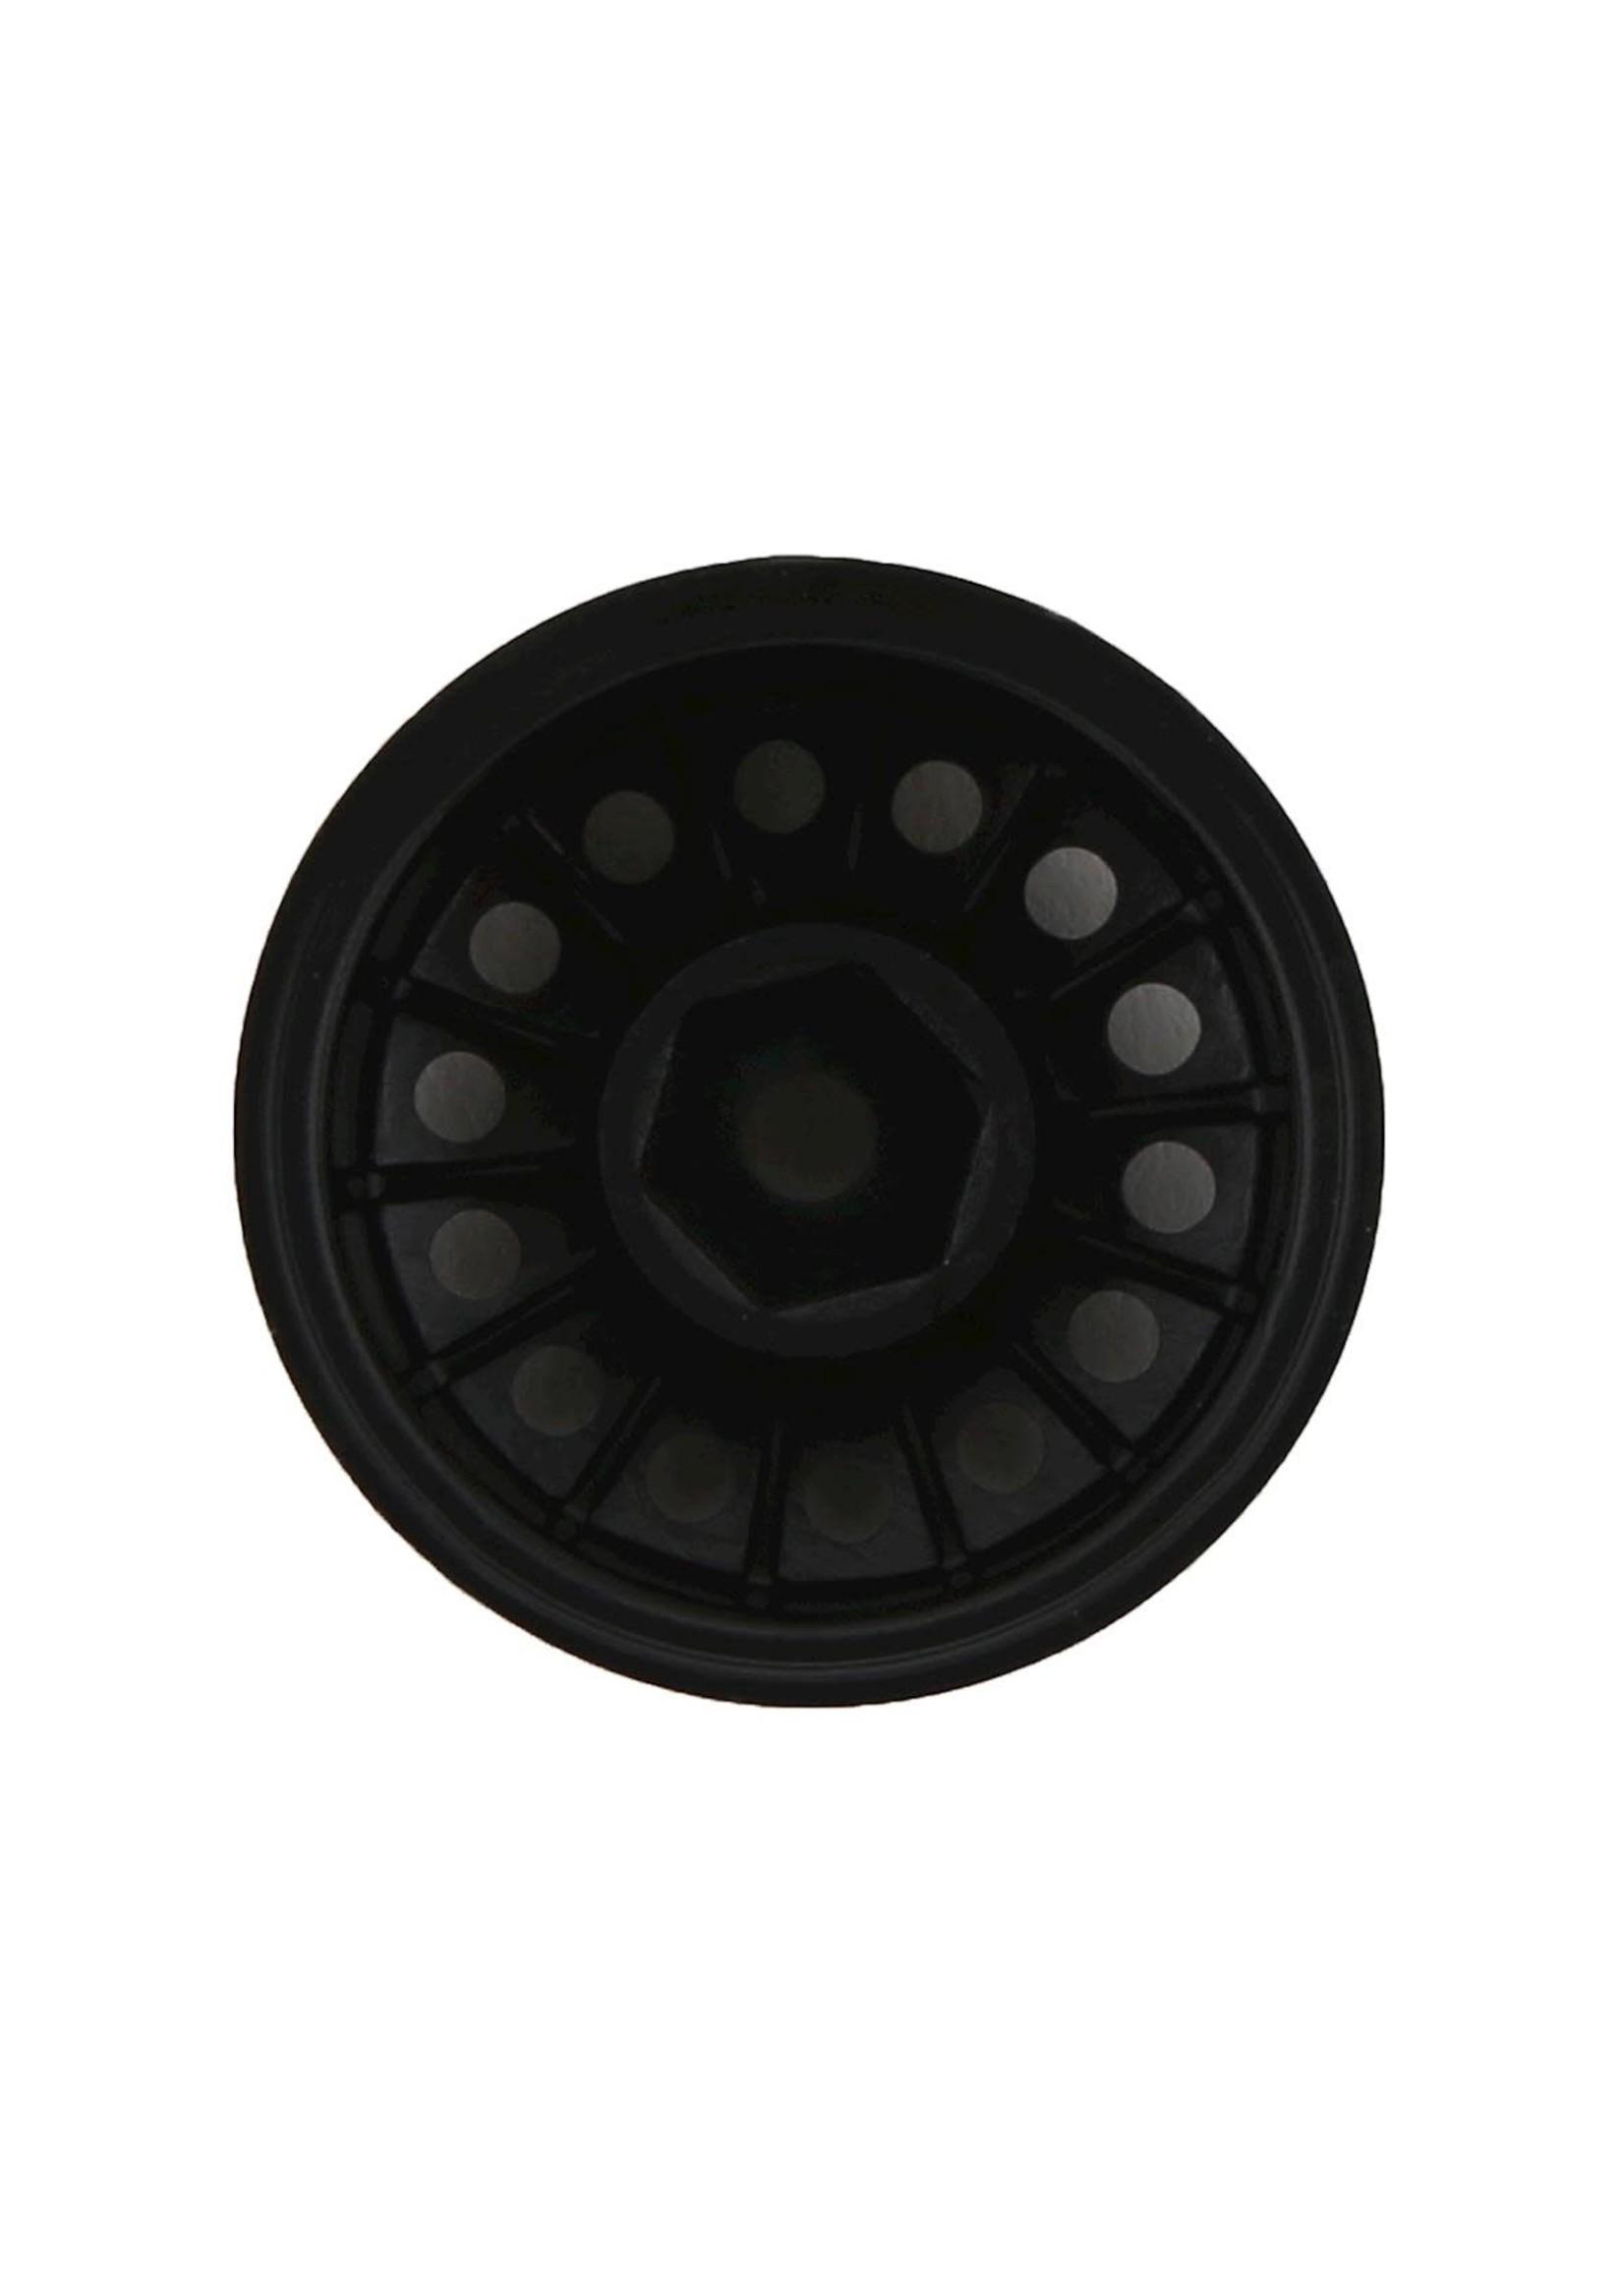 Axial AXI40000 Axial 1.0 Method MR307 Hole Wheels (4pcs): SCX24